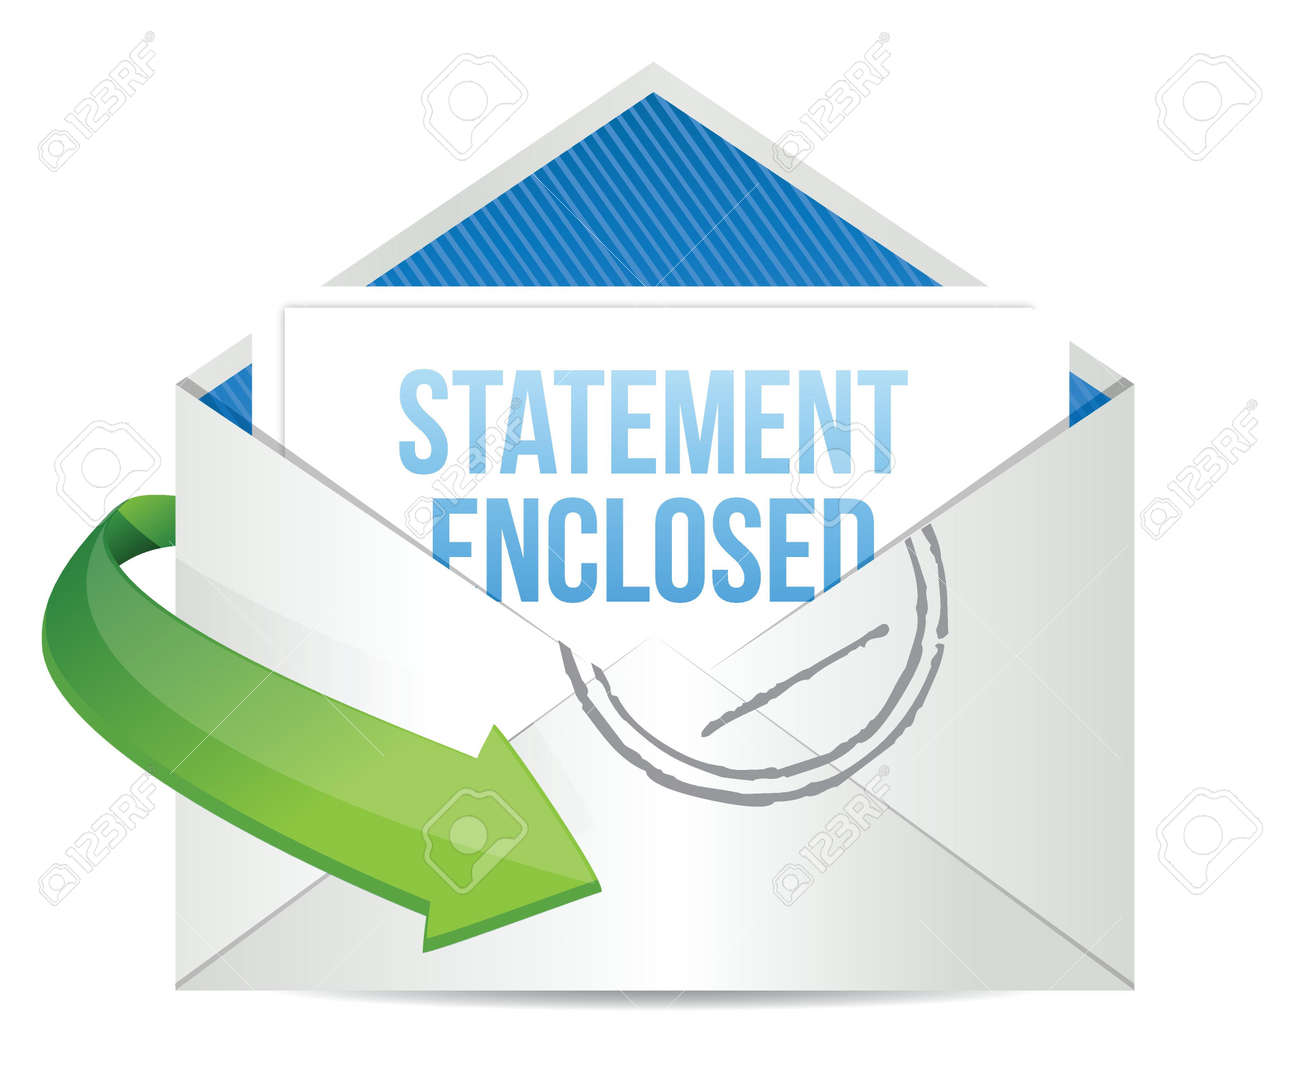 statement enclosed envelope mail correspondence illustration design over white Stock Vector - 18278971